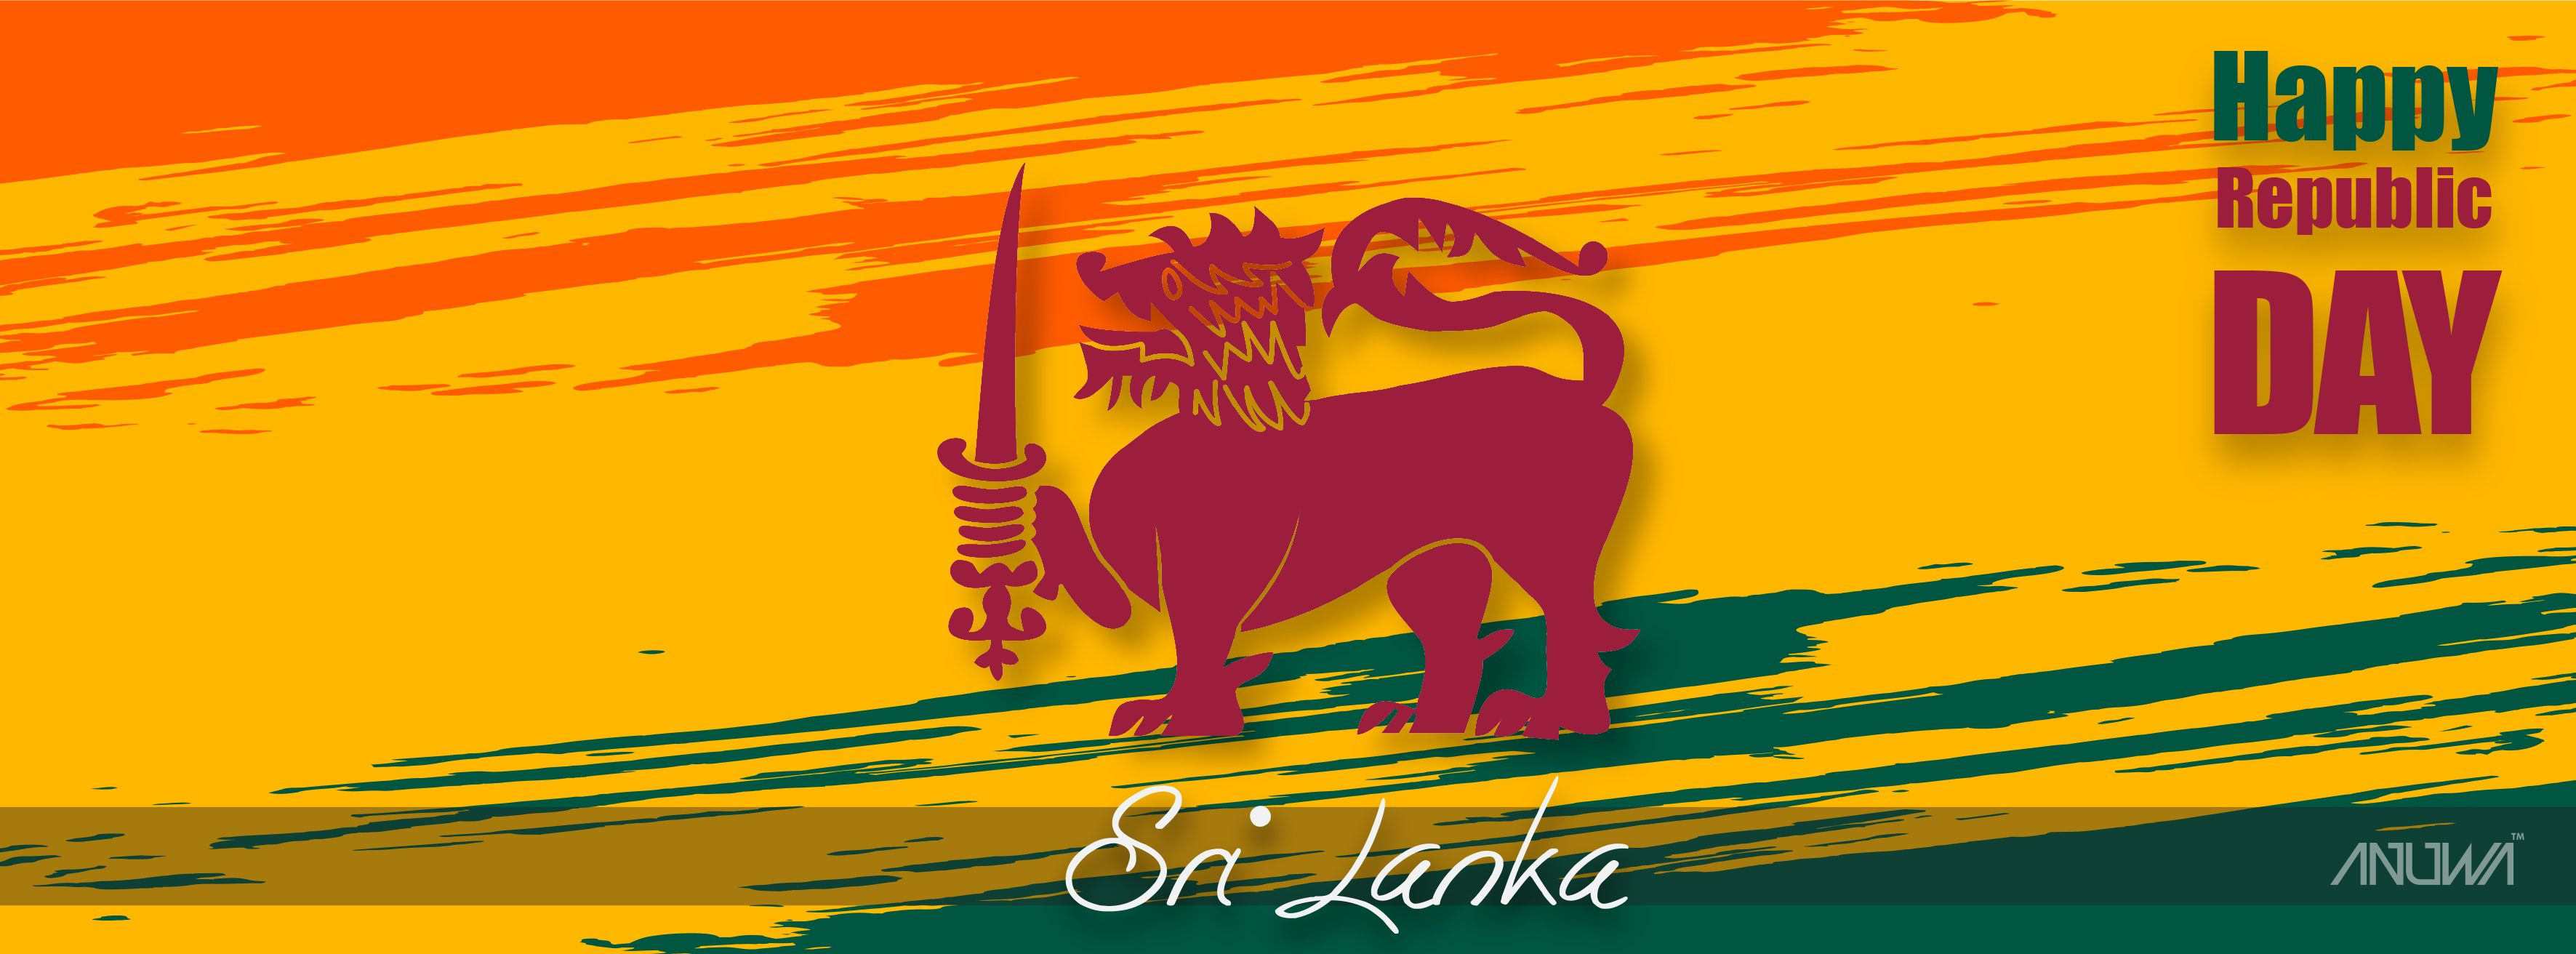 Independence day of sri lanka essay